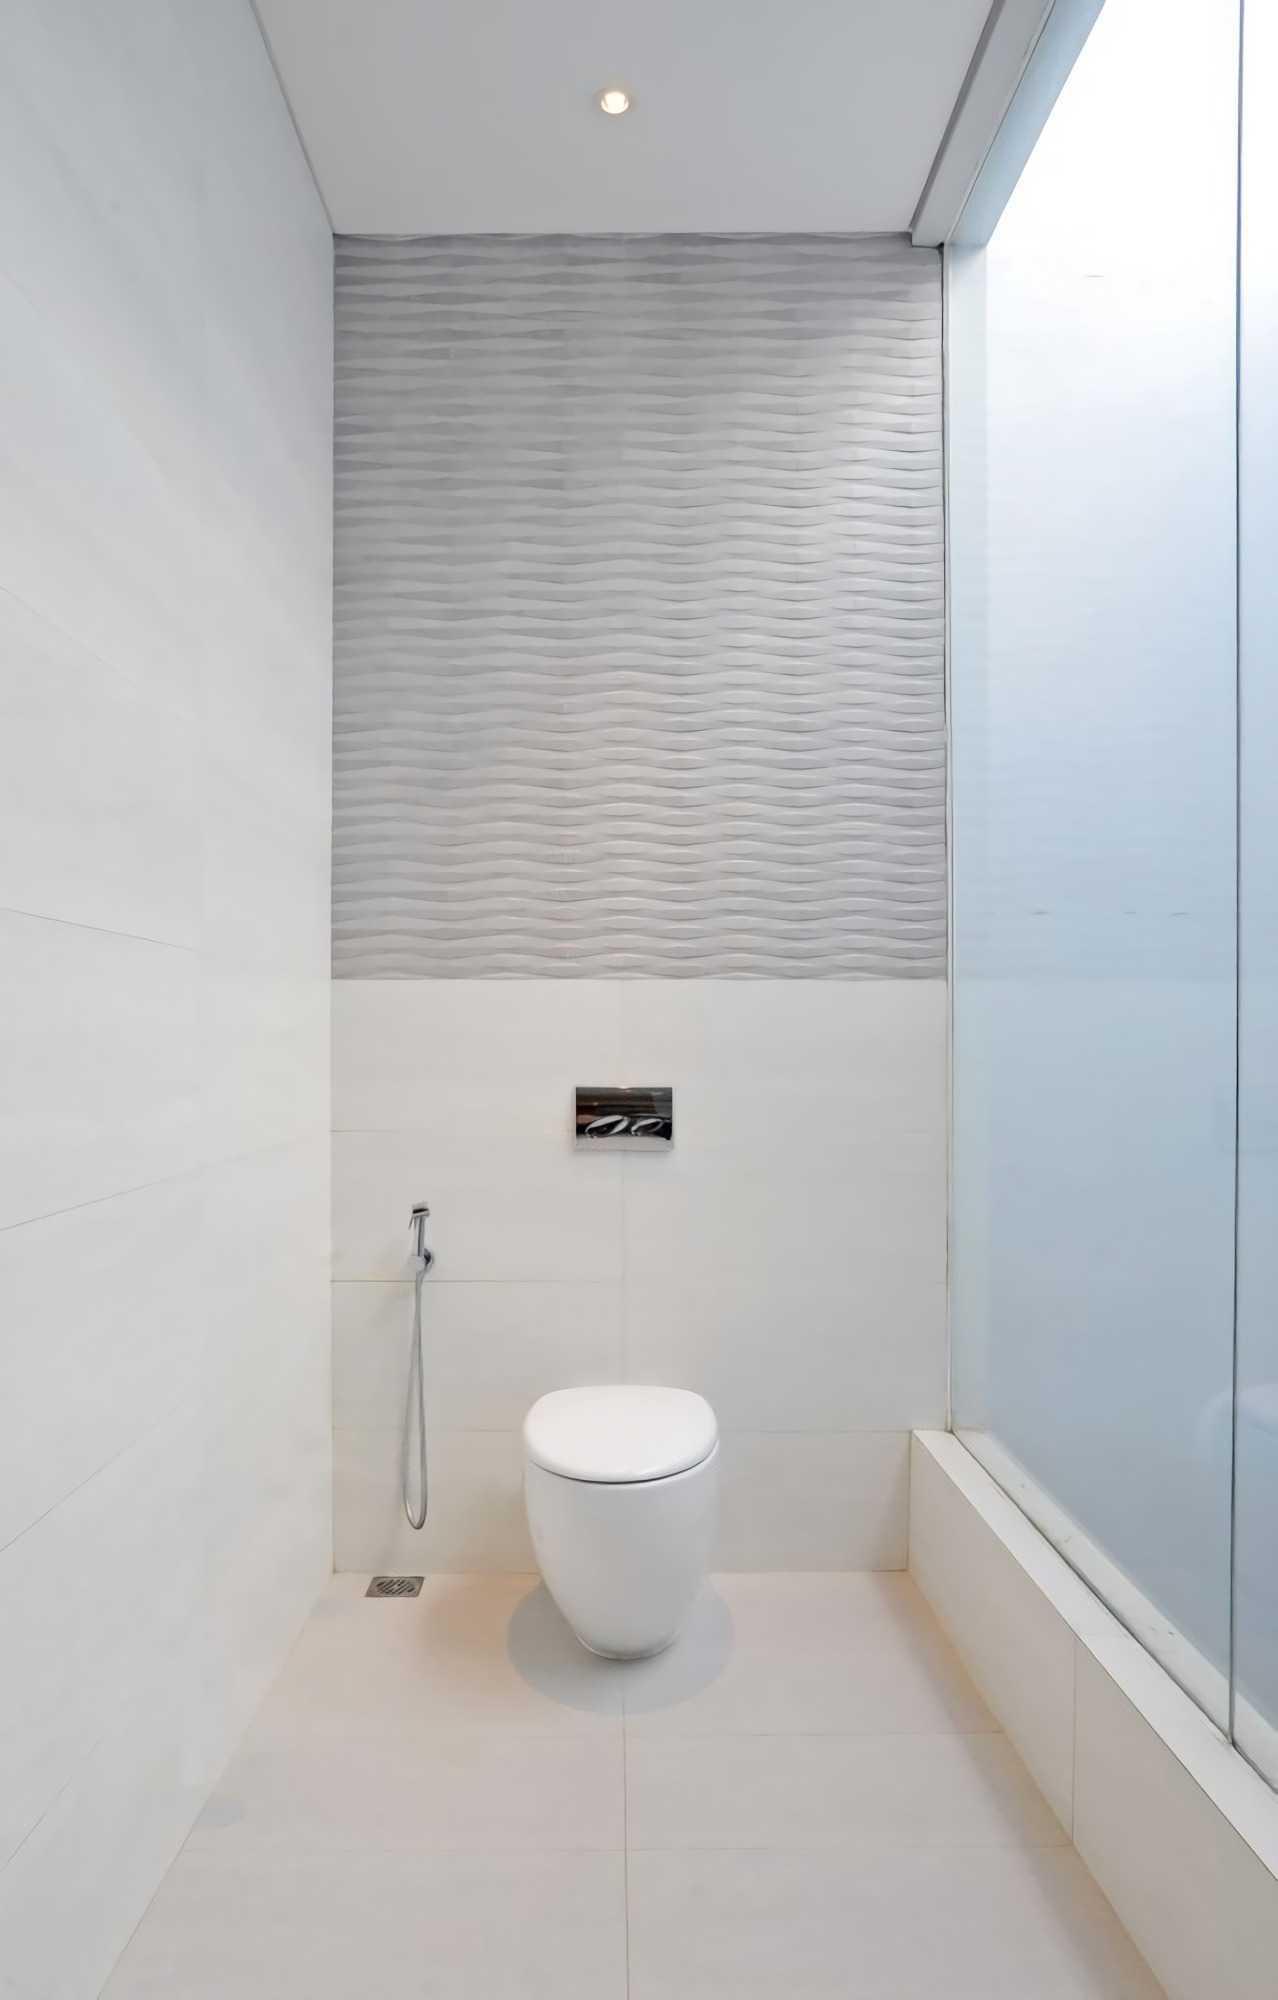 Ivan Priatman Architecture Ddyw Residence Surabaya, Kota Sby, Jawa Timur, Indonesia Surabaya Bathroom   23727